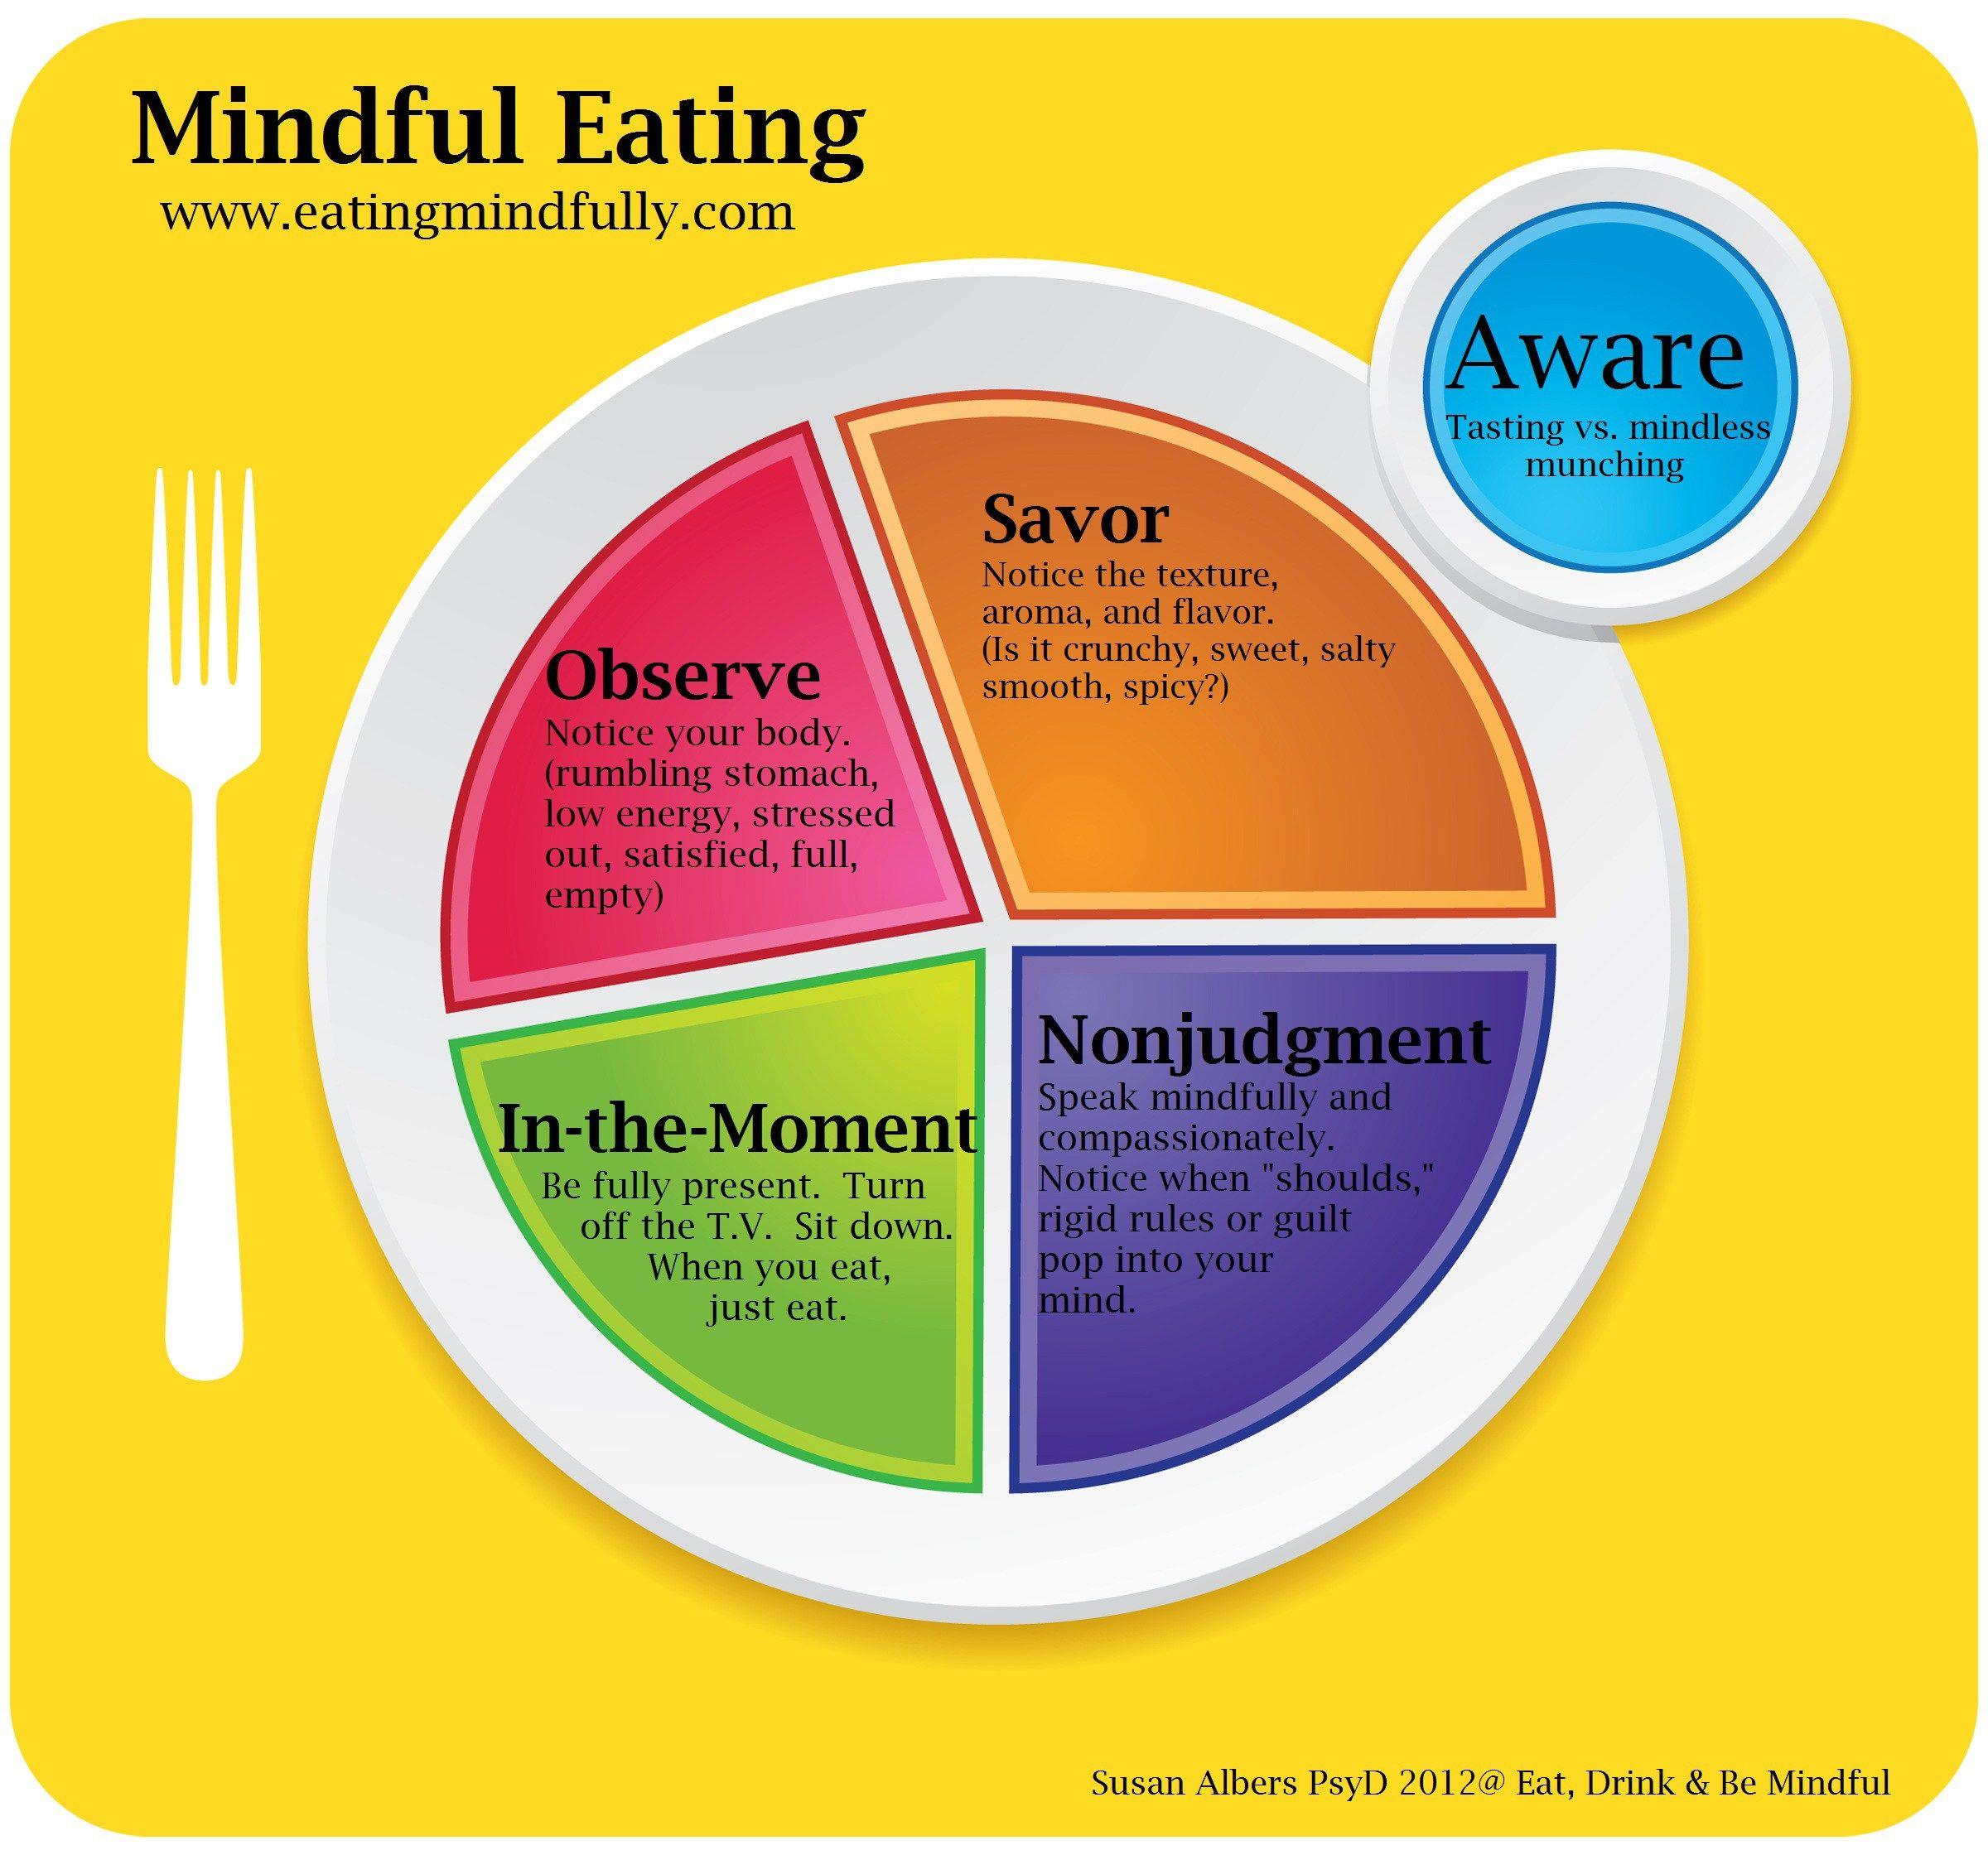 mindful eating diagram creating beautiful tables mindful eating diagram of a goat eating grass diagram of eating [ 2400 x 2240 Pixel ]